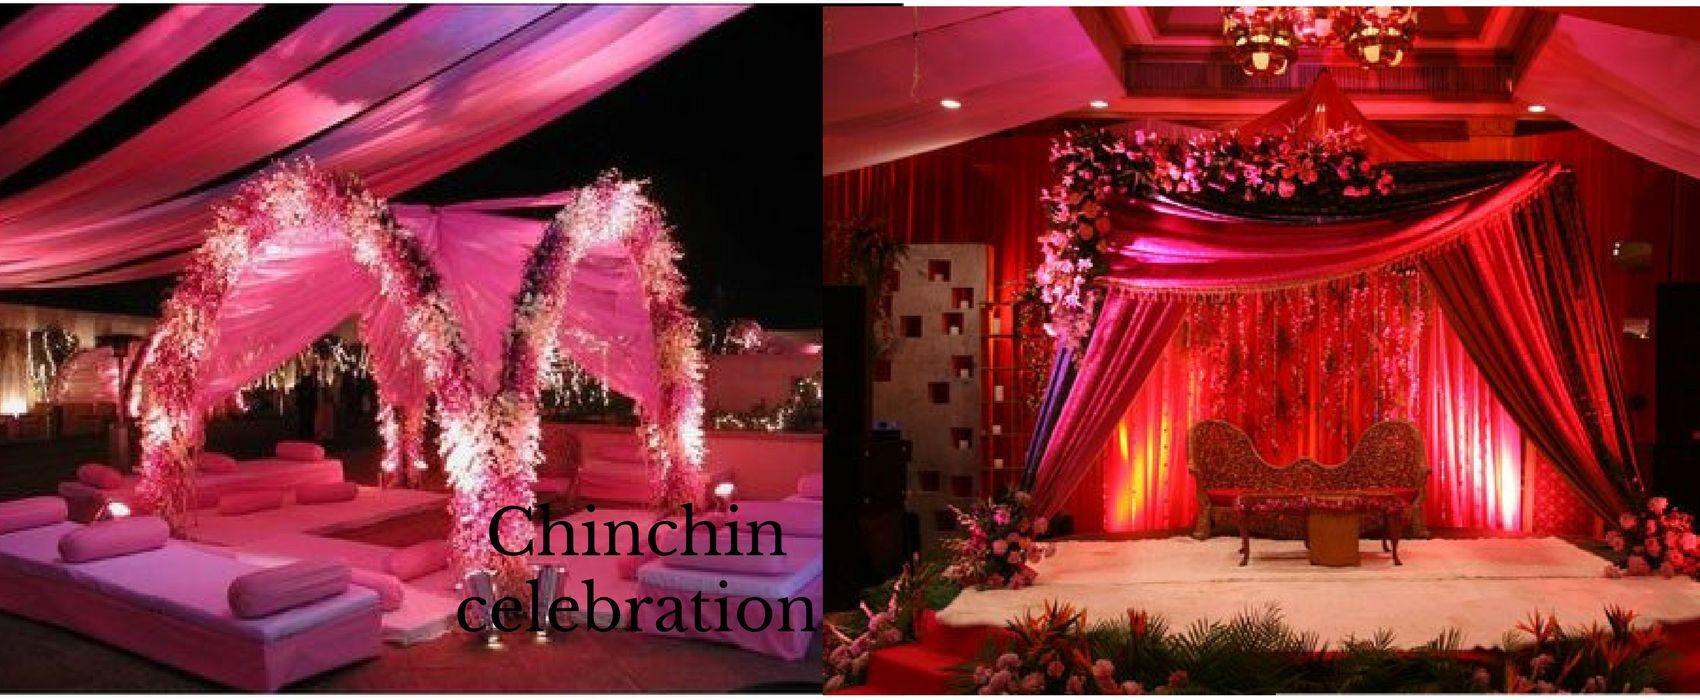 Wedding Planner Gurgaon | Event Planner Gurgaon